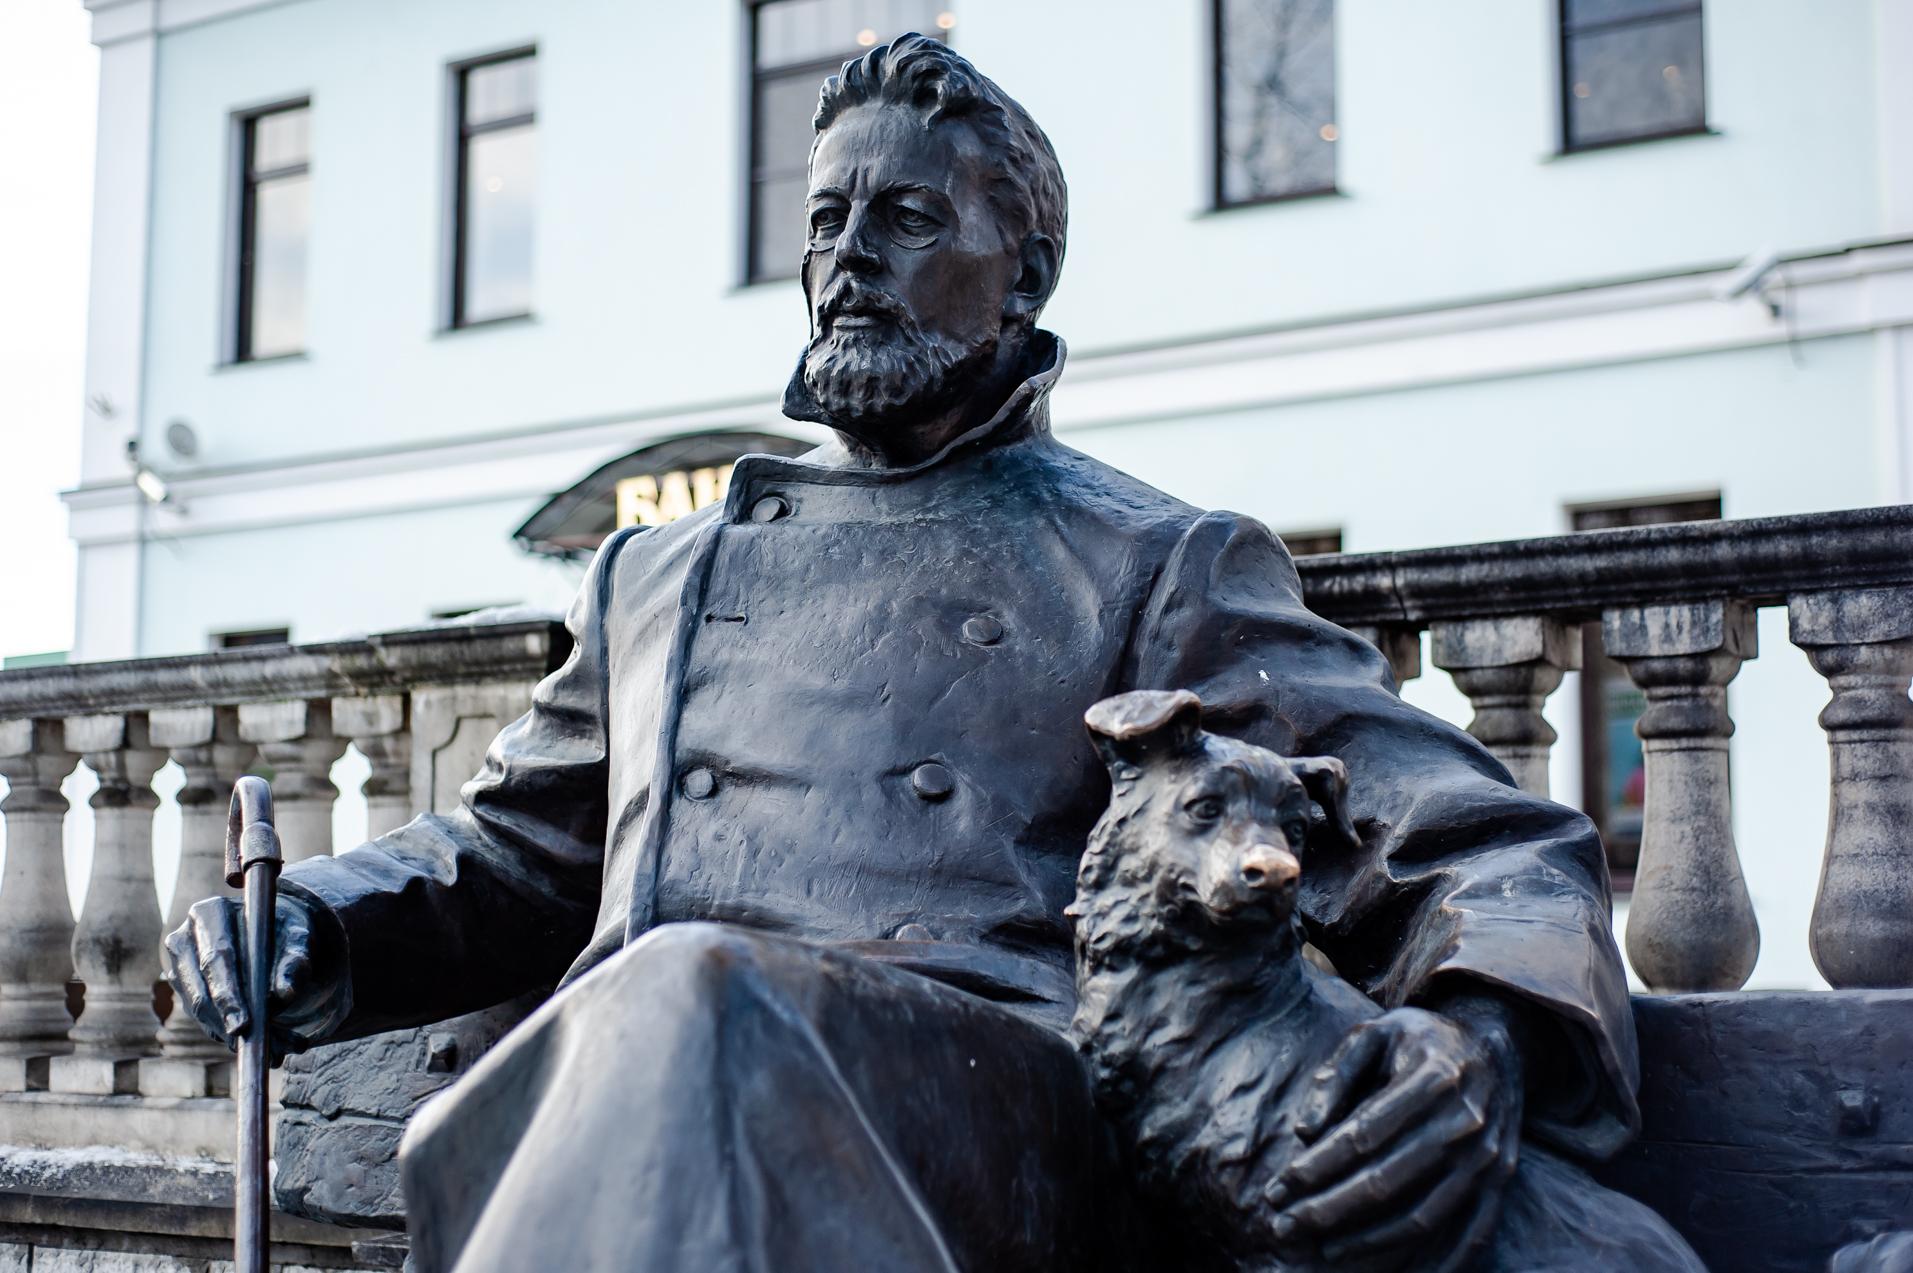 Звенигород, Сквер им.А.П.Чехова, Памятник А.П. Чехову